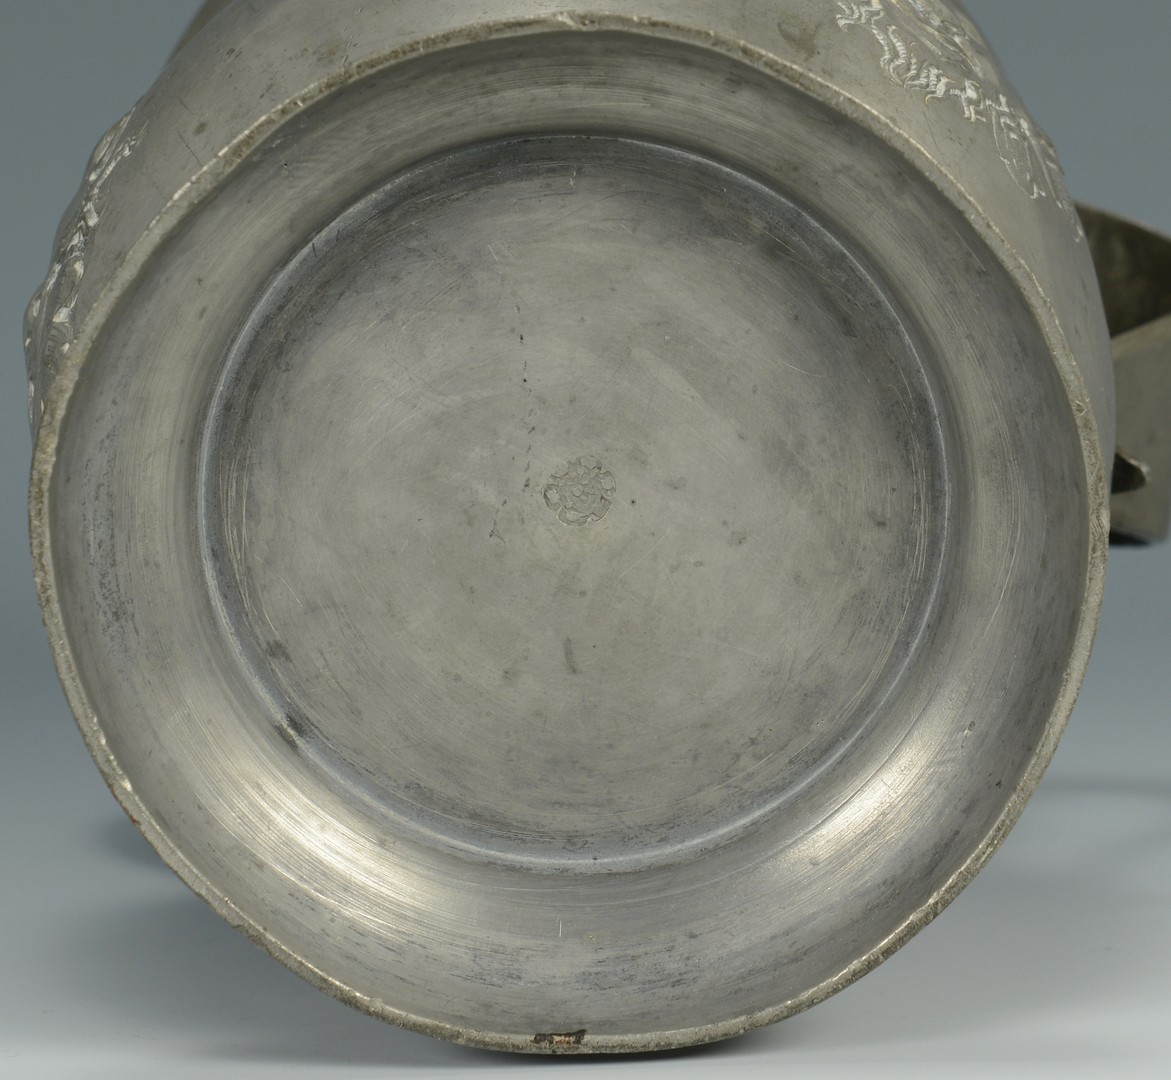 Lot 770: 7 pcs Pewter Hollowware